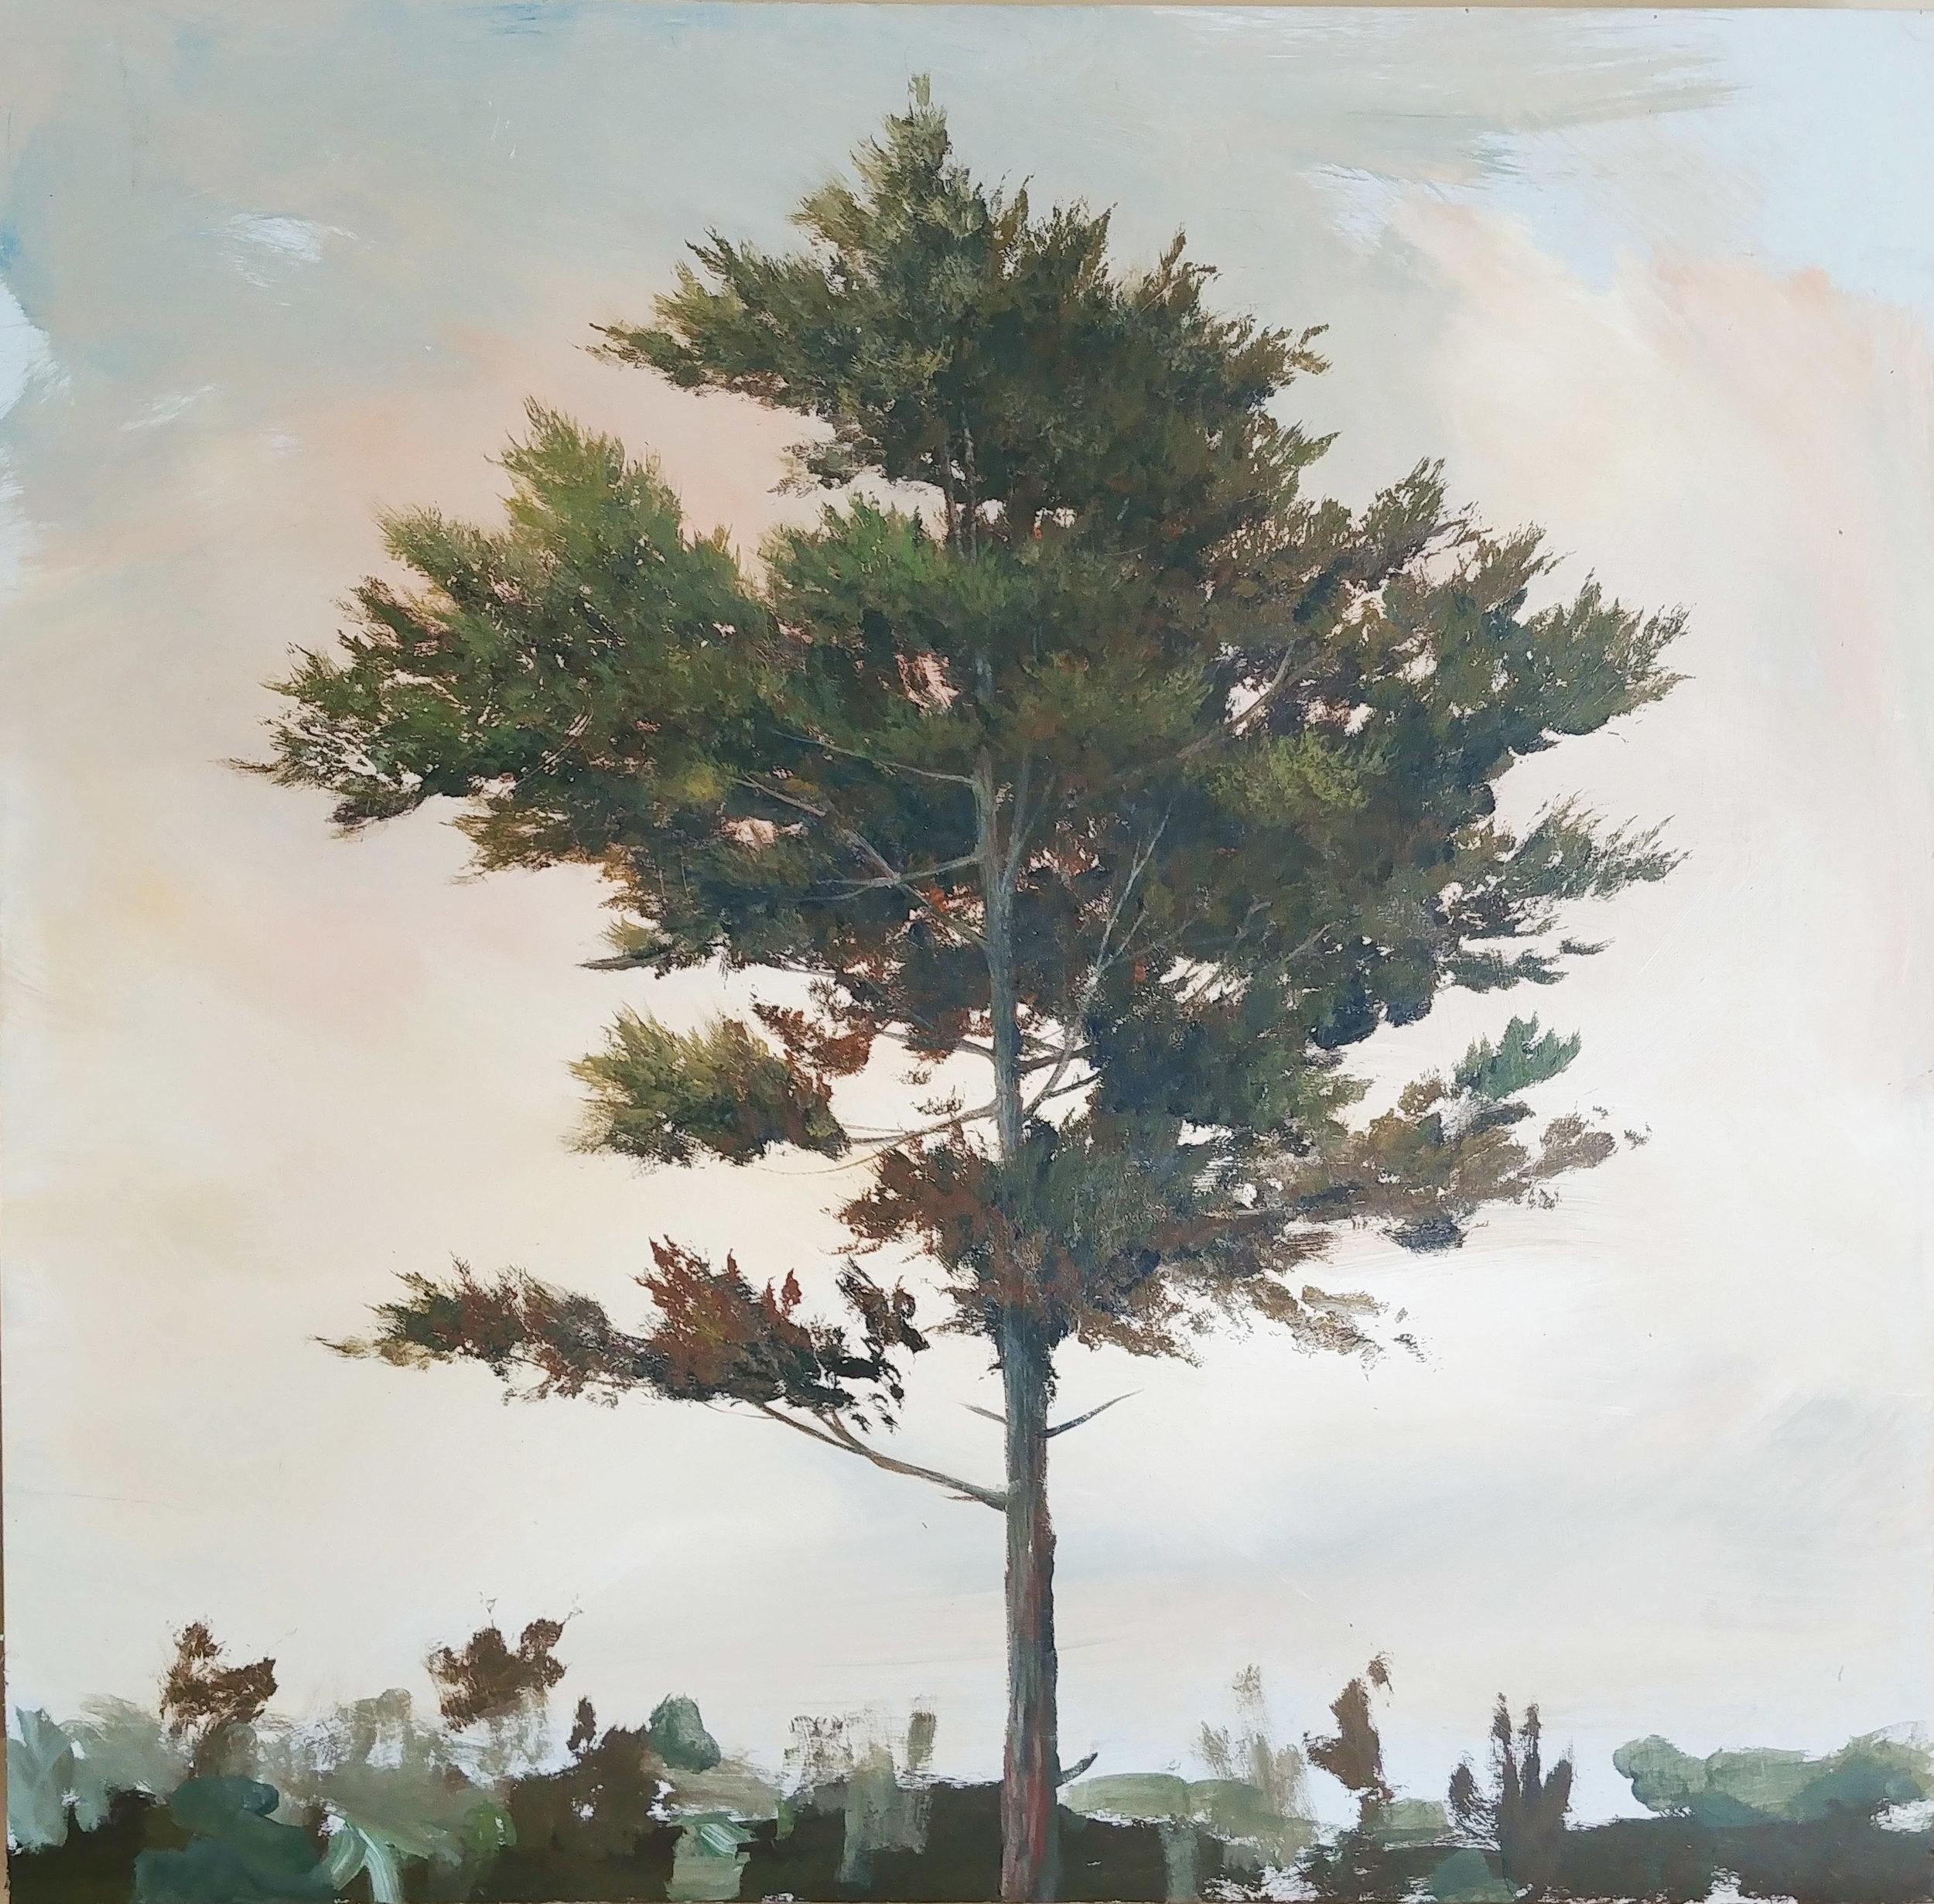 Pine 3, 2018